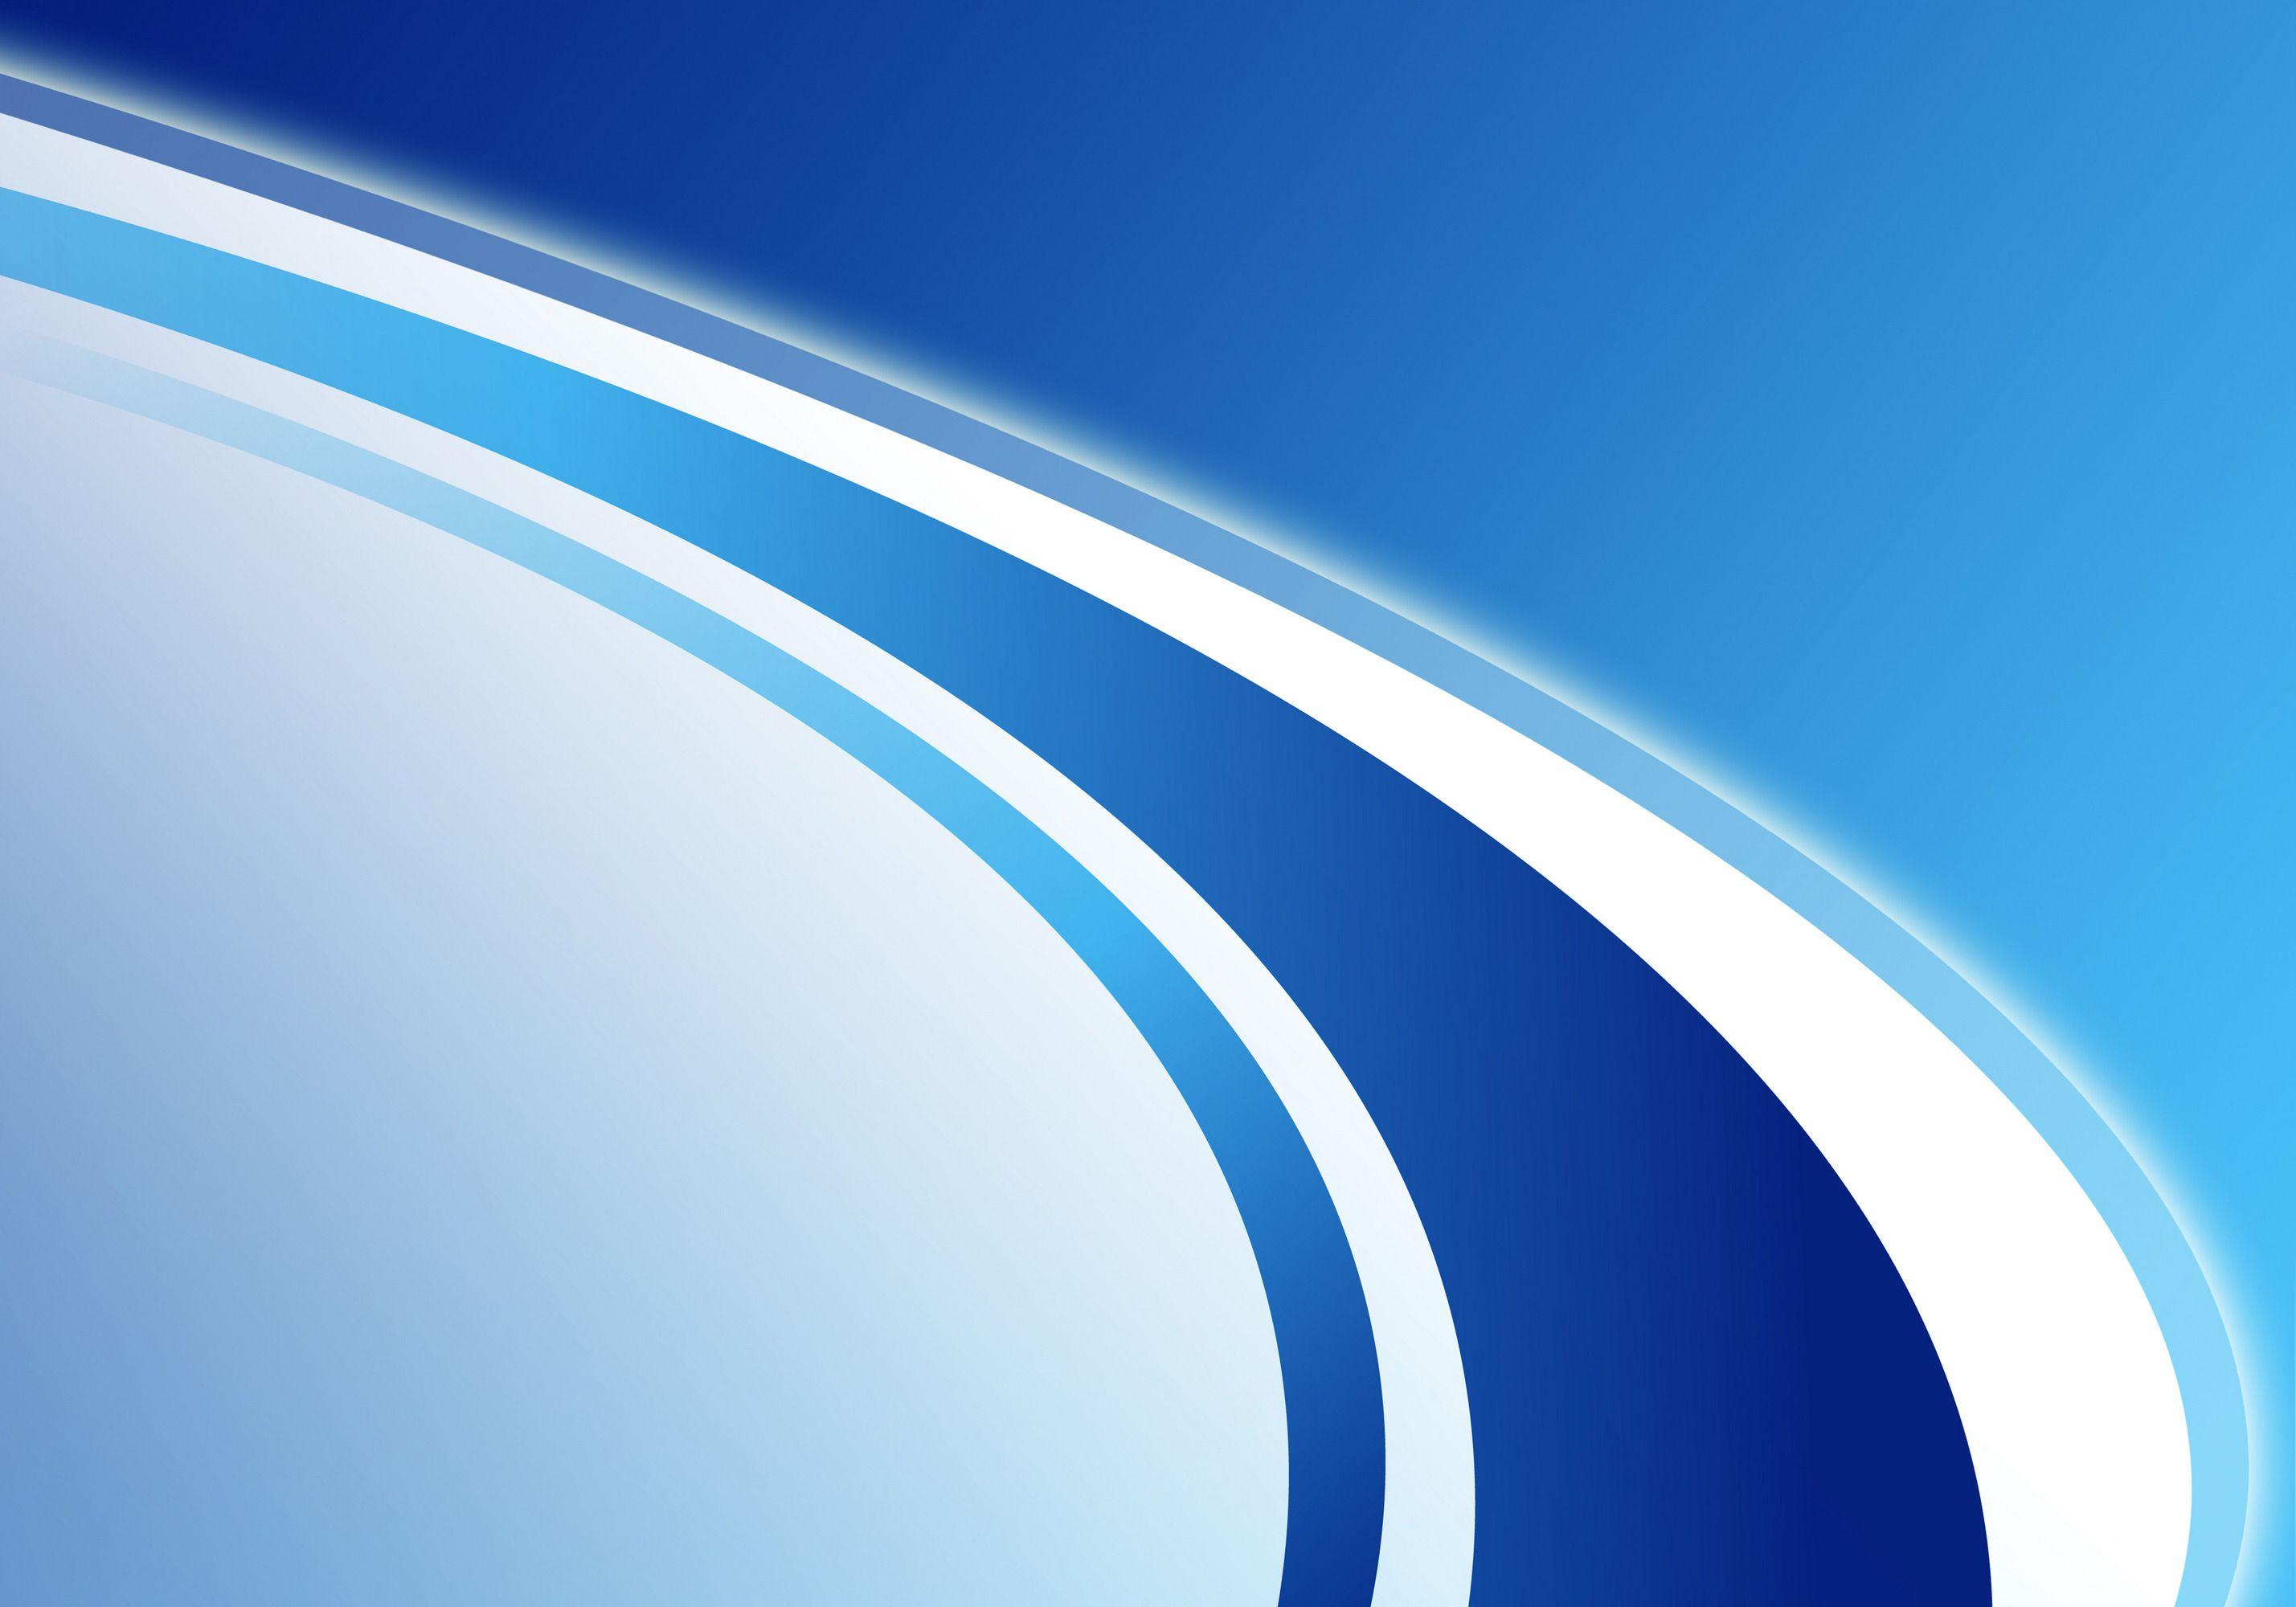 Blue And White Hd Desktop Wallpaper High Definition